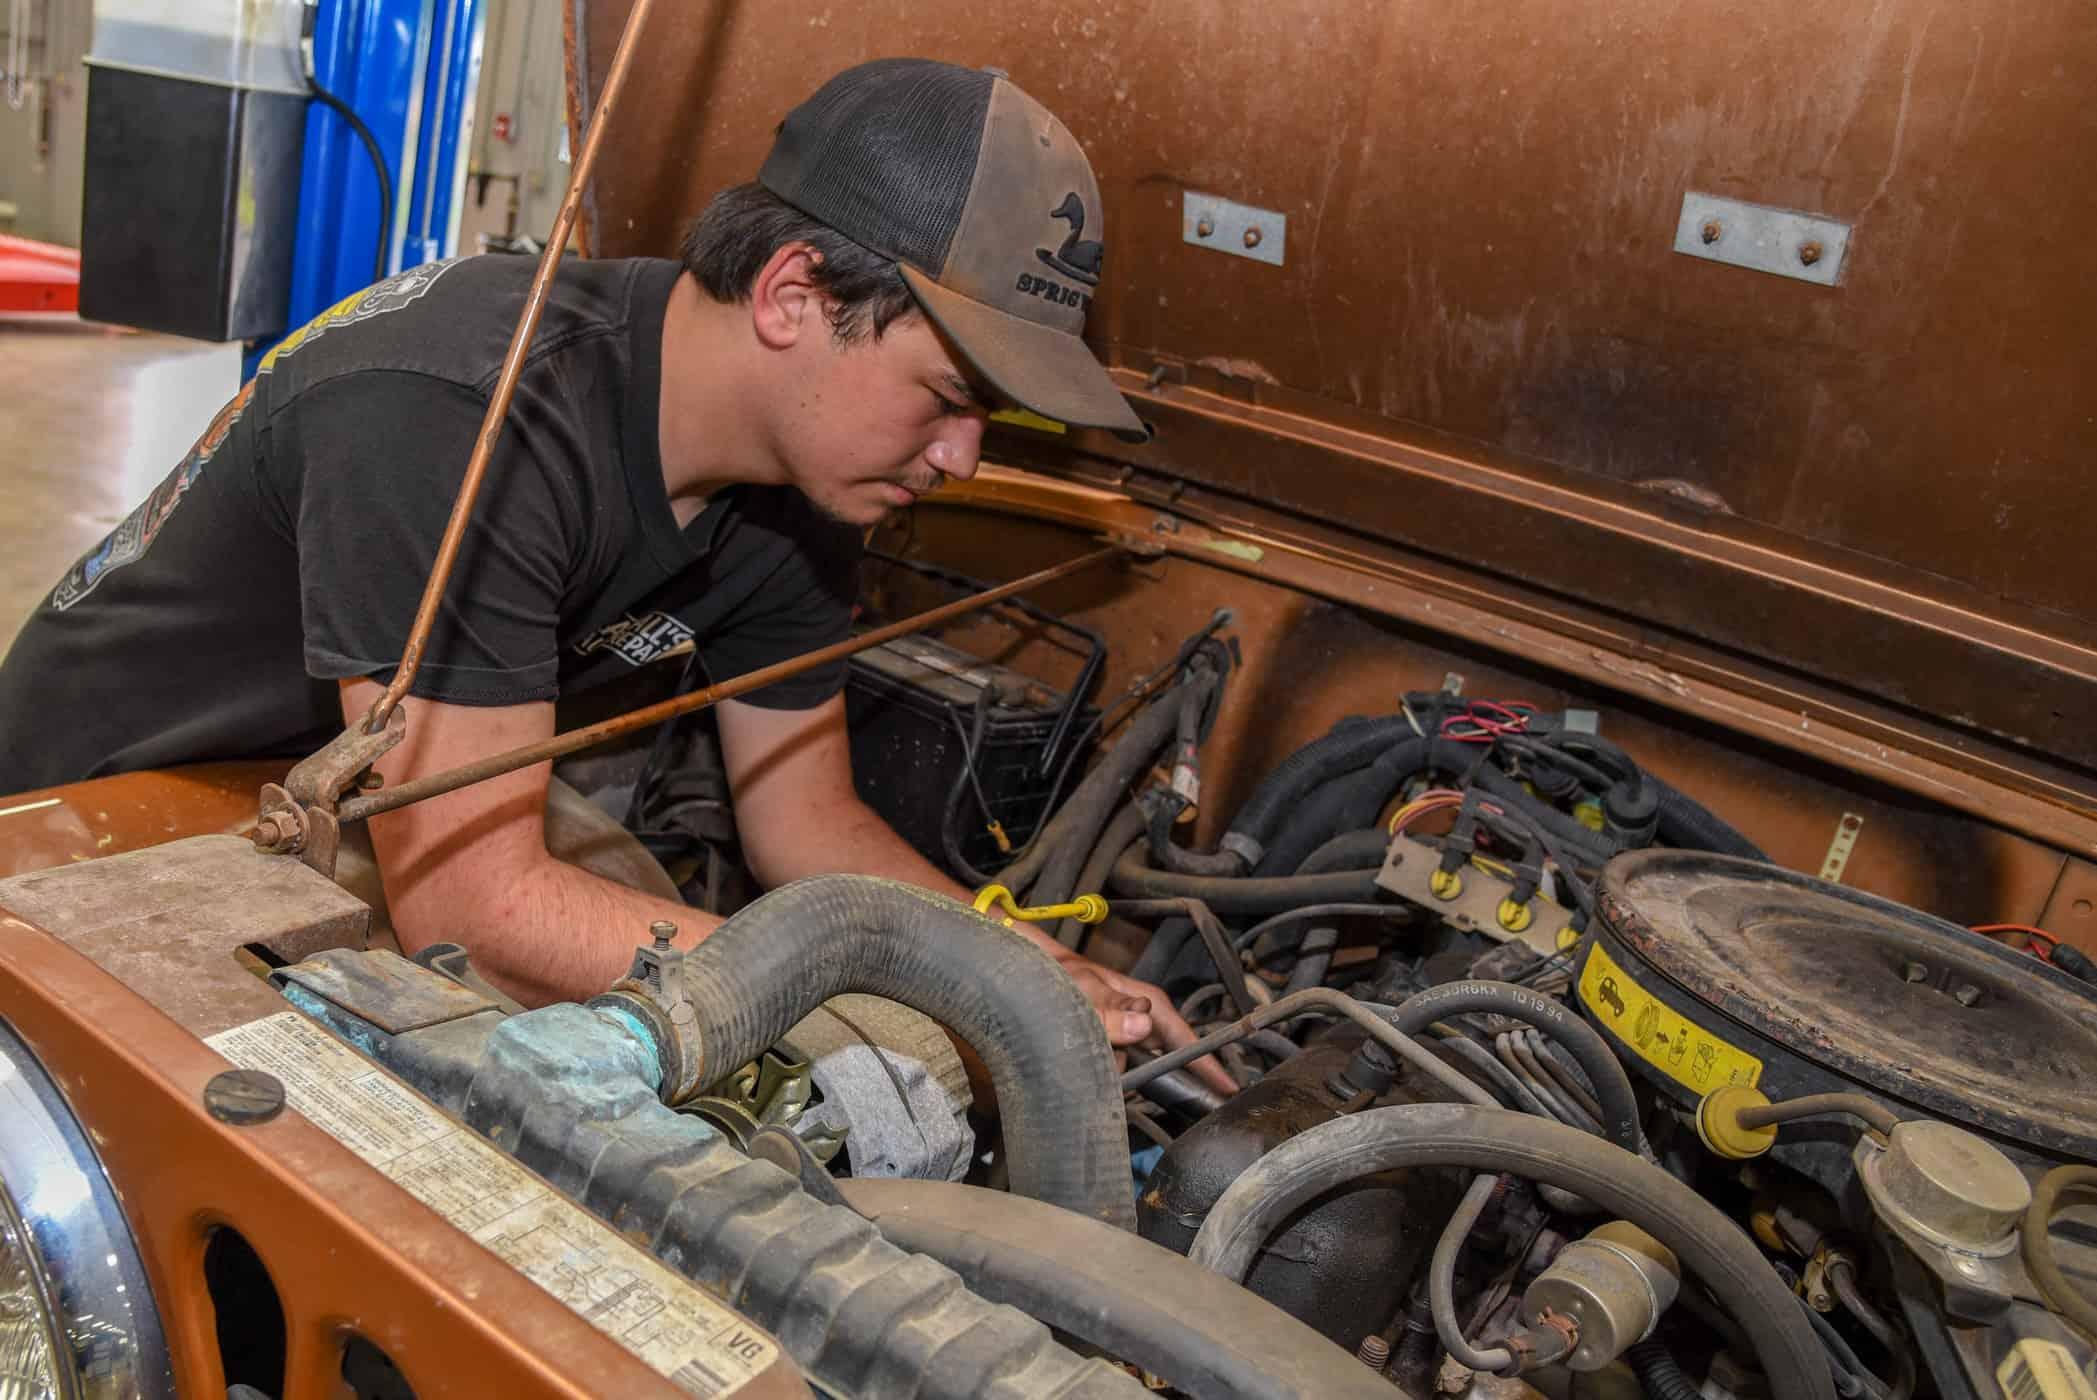 Christopher Waller works under the hood of an burnt orange jeep